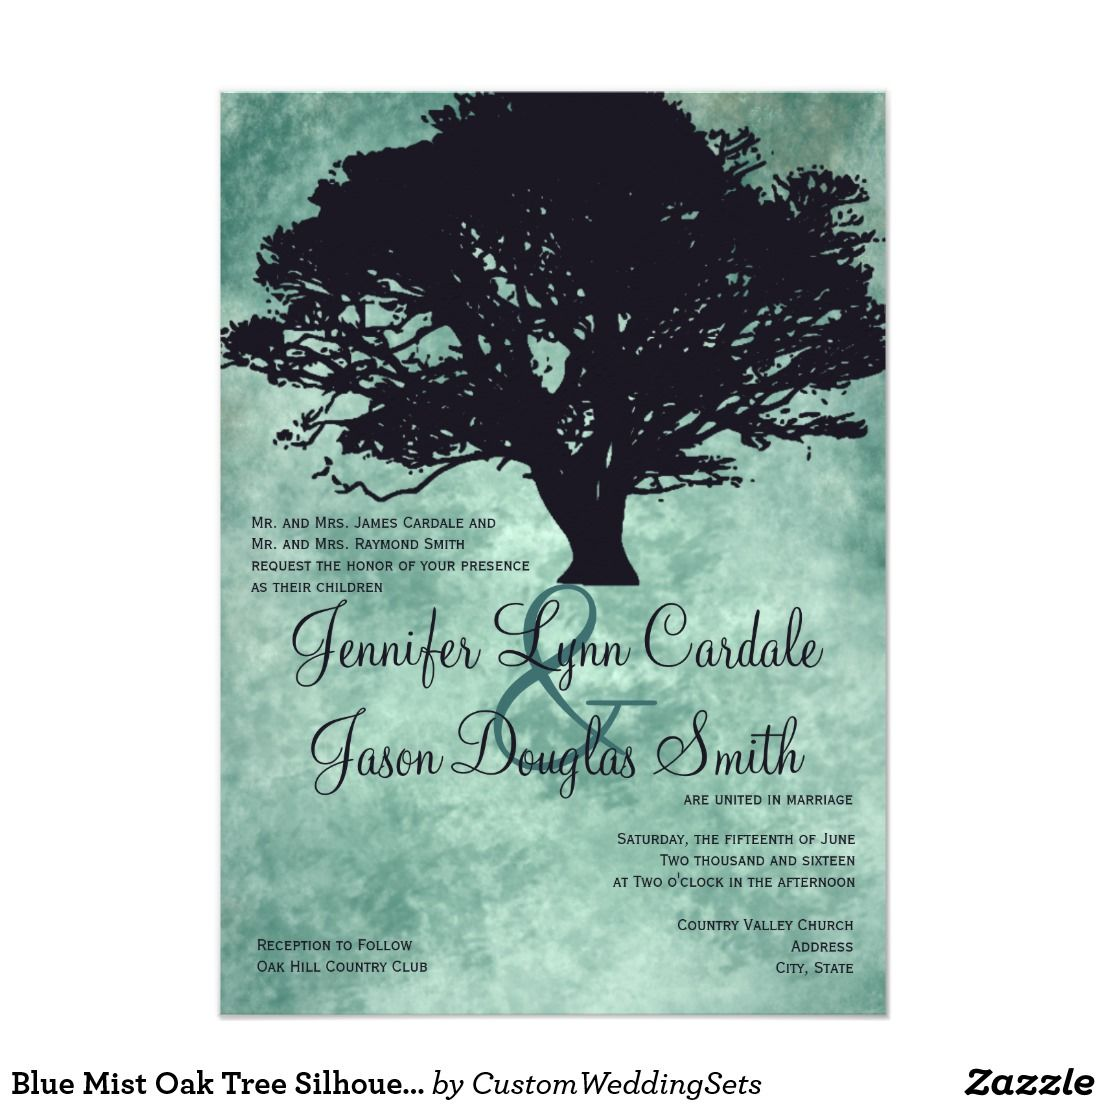 Blue Mist Oak Tree Silhouette Wedding Invitations Tree Silhouette